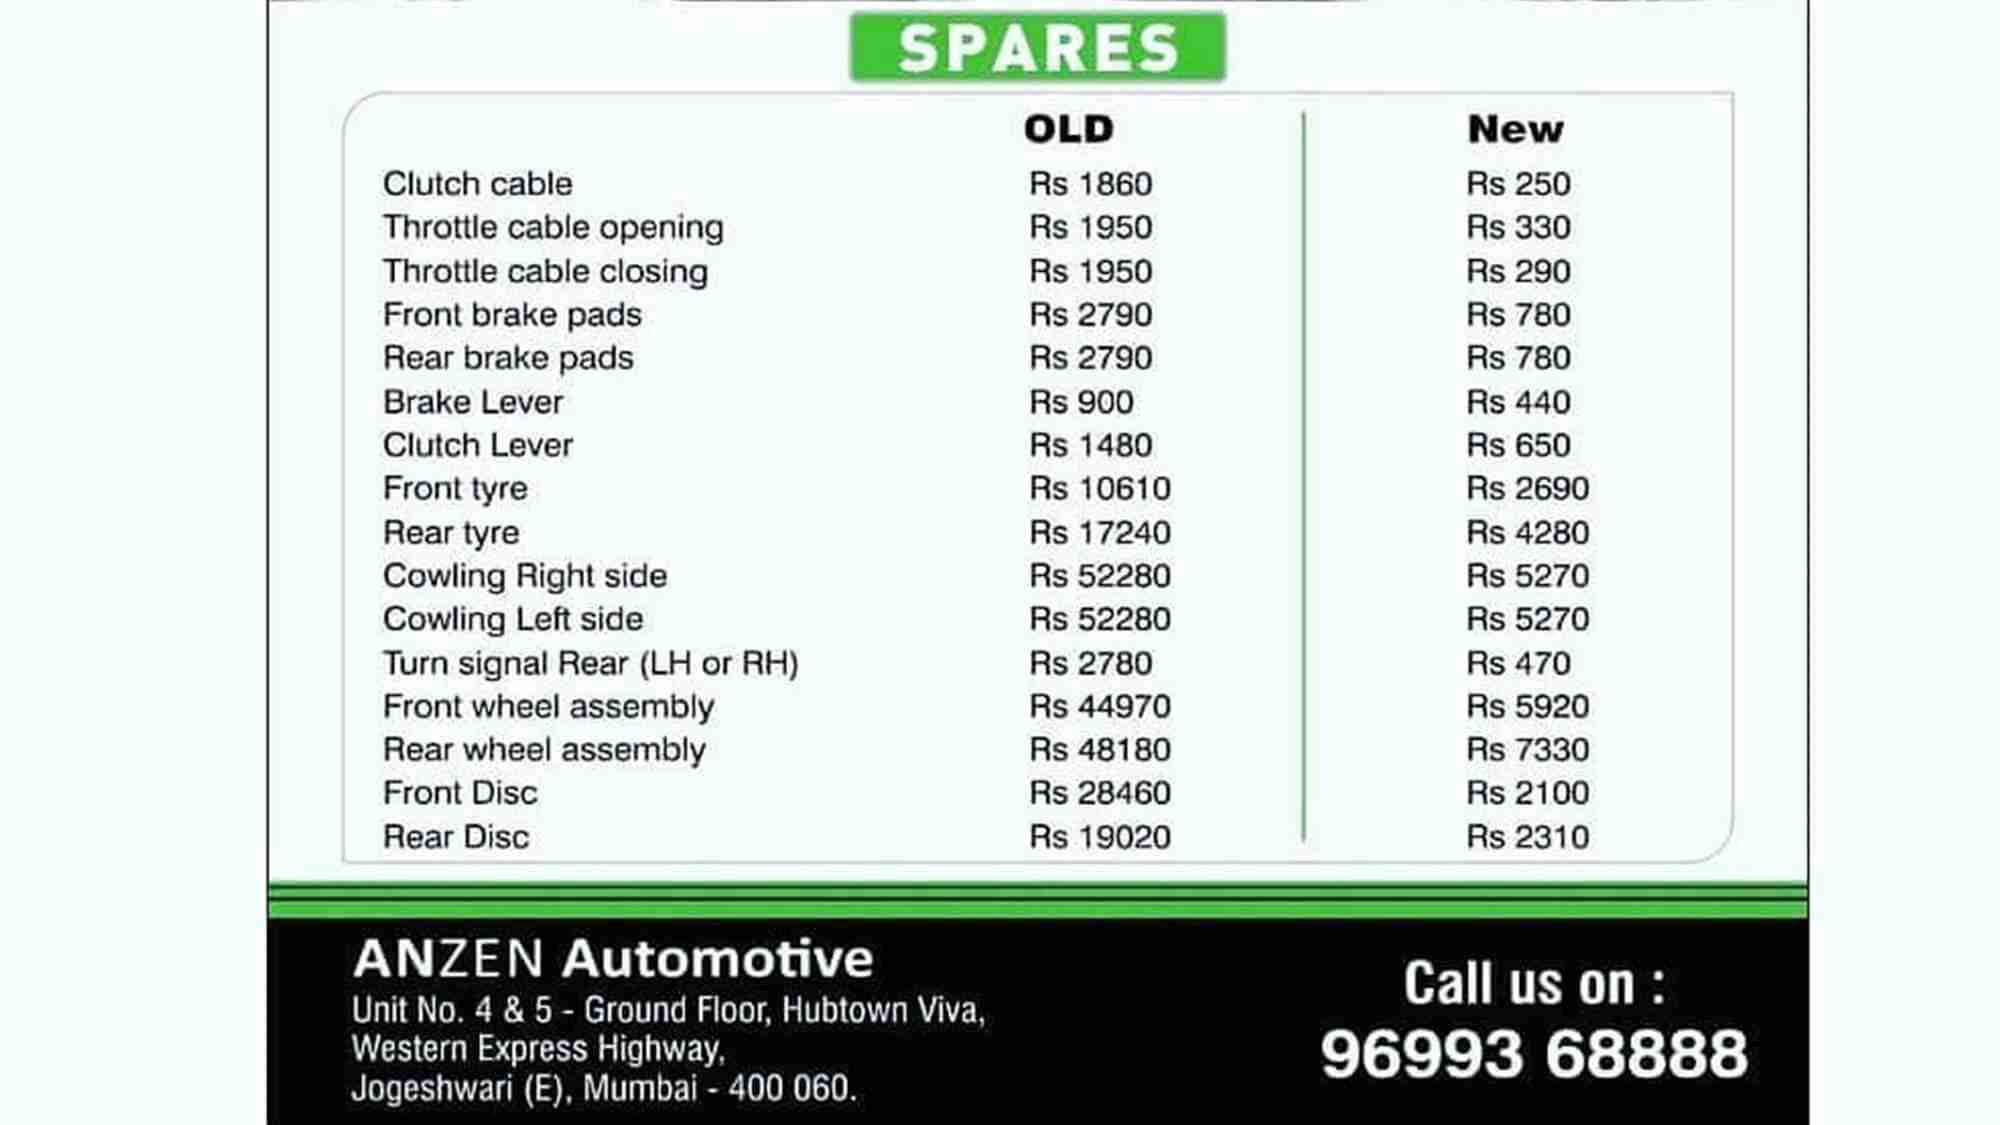 Ninja 300 spares price list